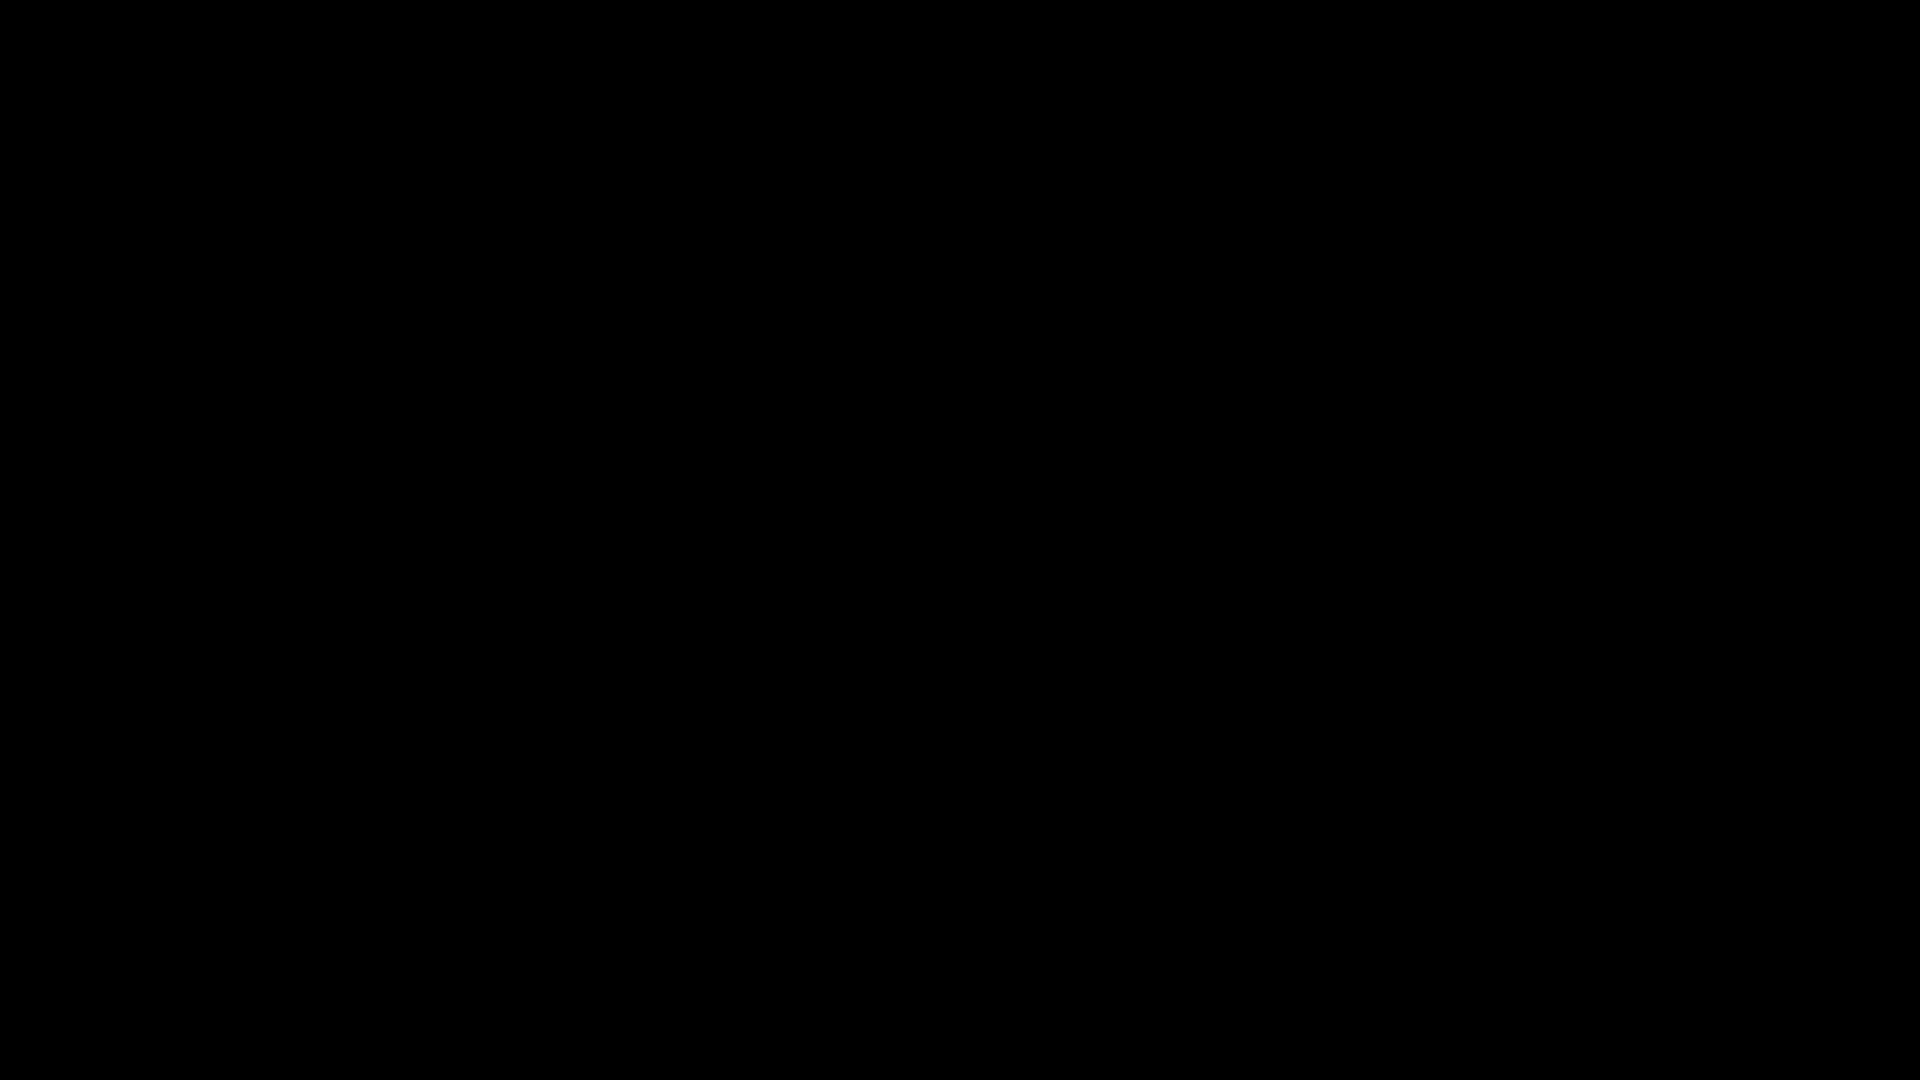 2010-10-04 14:34:42